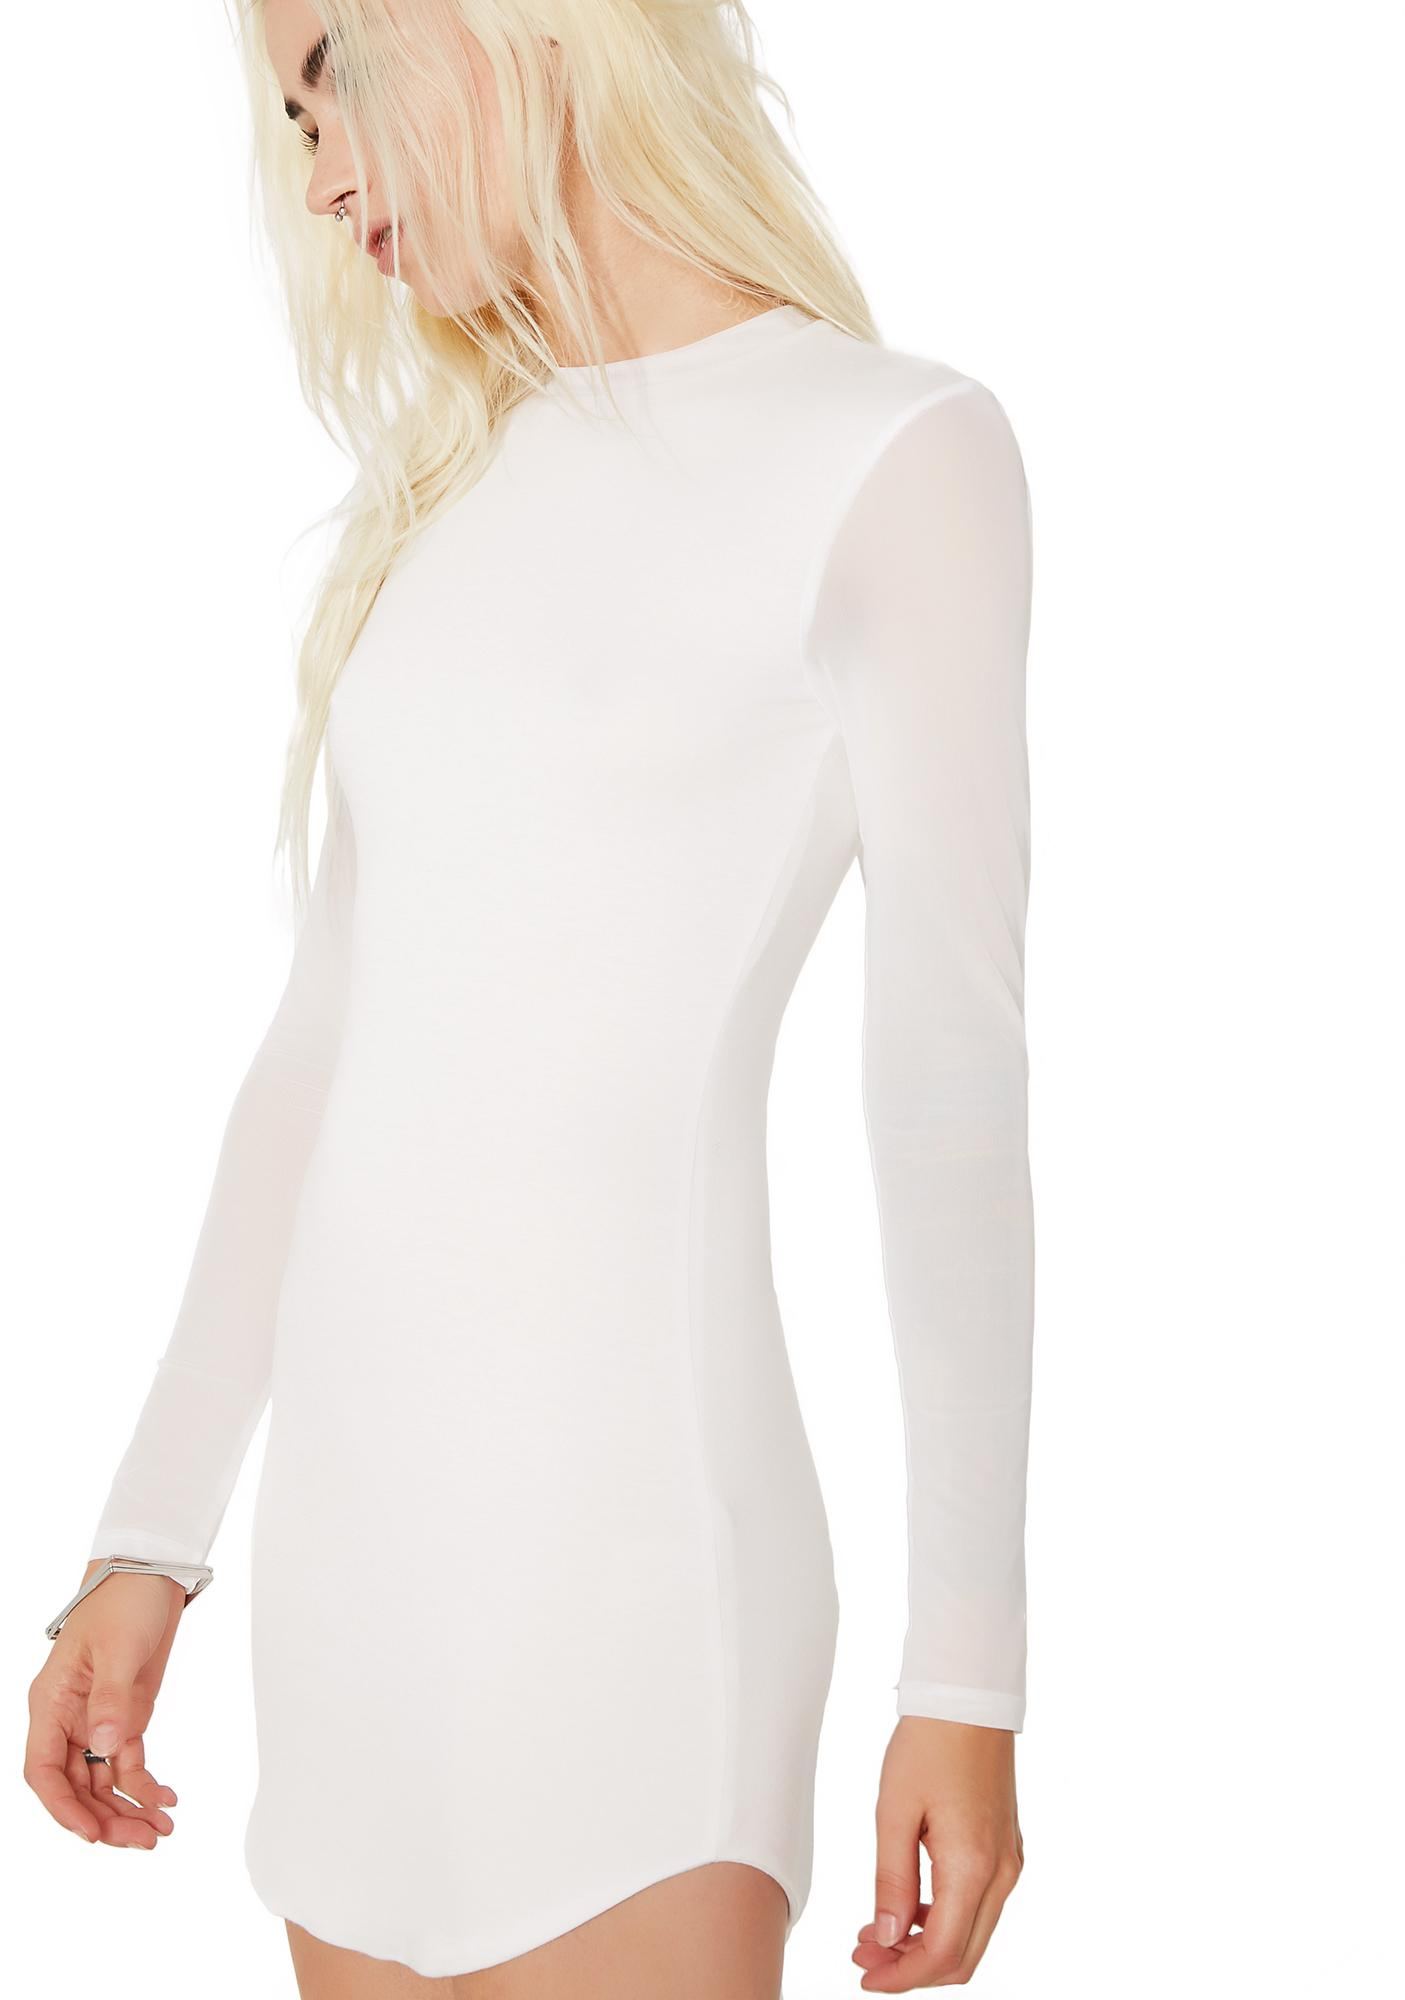 Blank Space Bodycon Dress